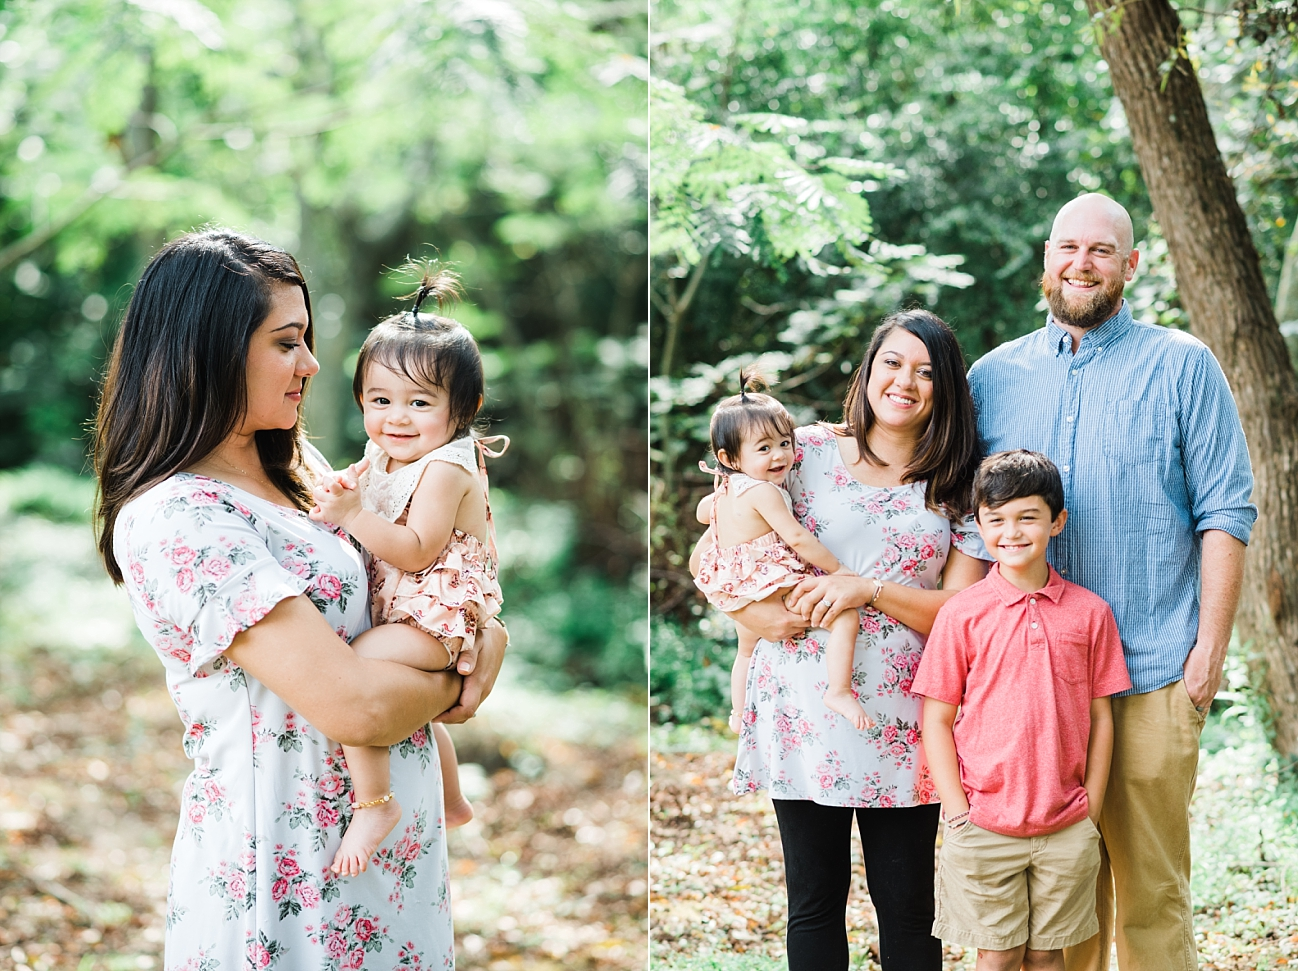 ALLEN FAMILY | OUTDOOR FAMILY SESSION IN SPRINGVILLE, AL